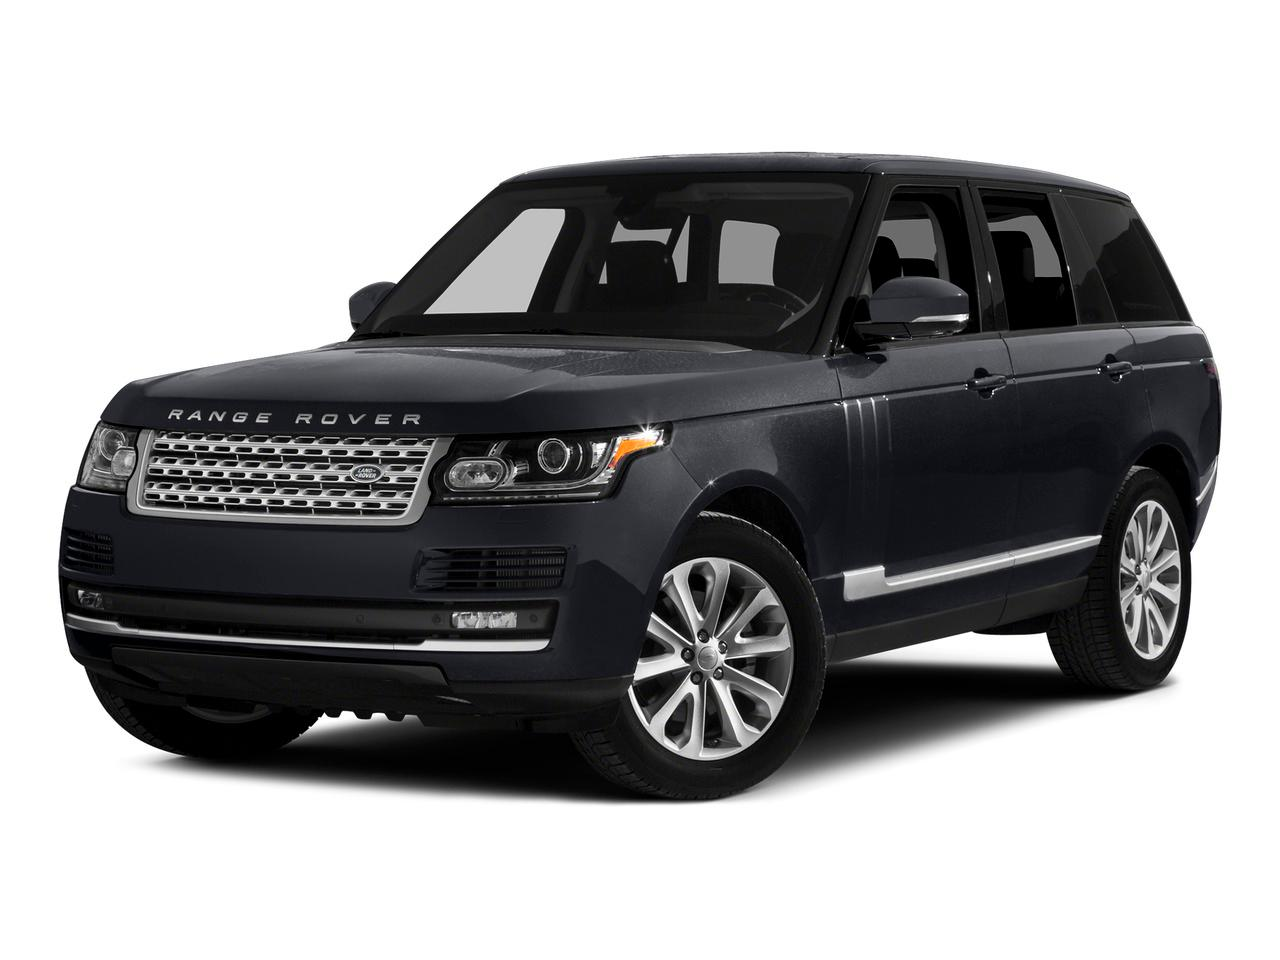 2015 Land Rover Range Rover Vehicle Photo in LAFAYETTE, LA 70503-4541